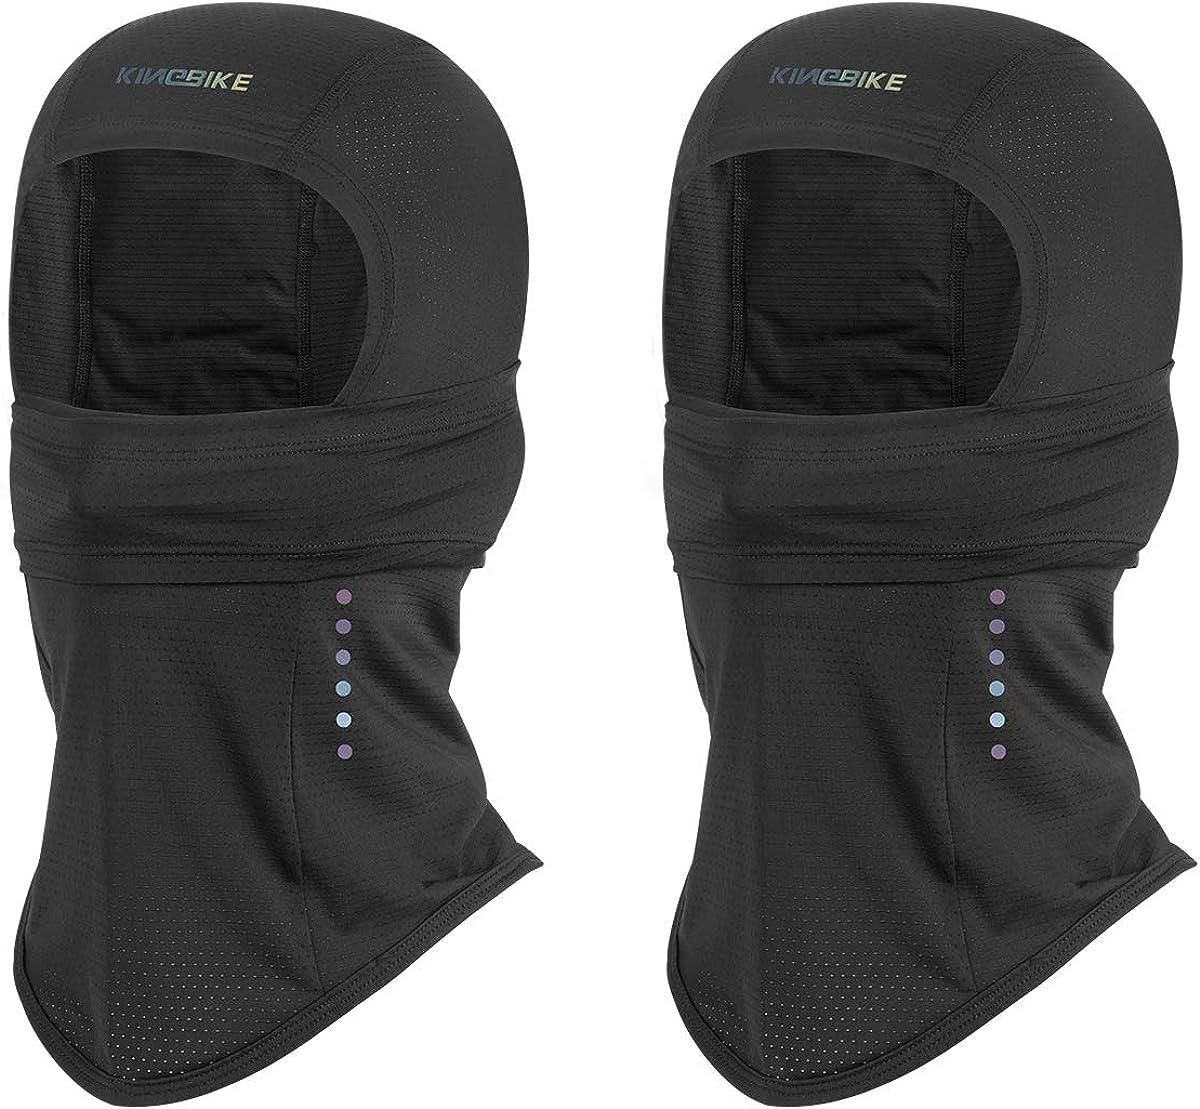 KINGBIKE Balaclava Face Mask Multifunction UV Protection UPF50++, Neck Gaiter,Bandana,Headwear,Advanced Fabric